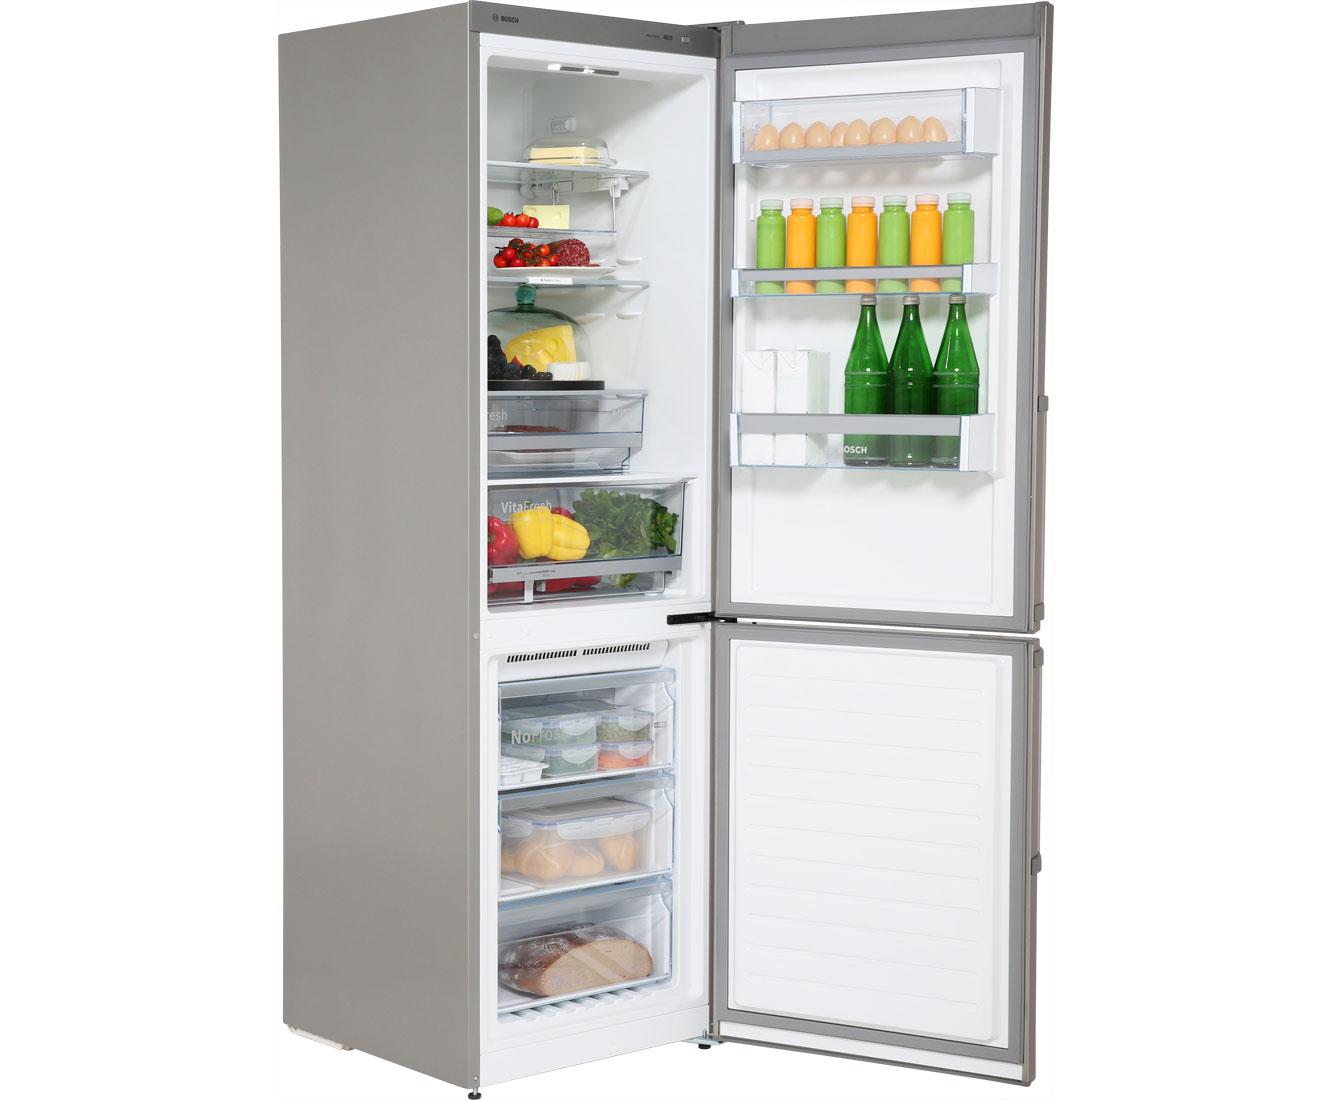 Kühlschrank Alarm : Bosch kühlschrank alarm leuchtet kühlschrank piept woran kann s